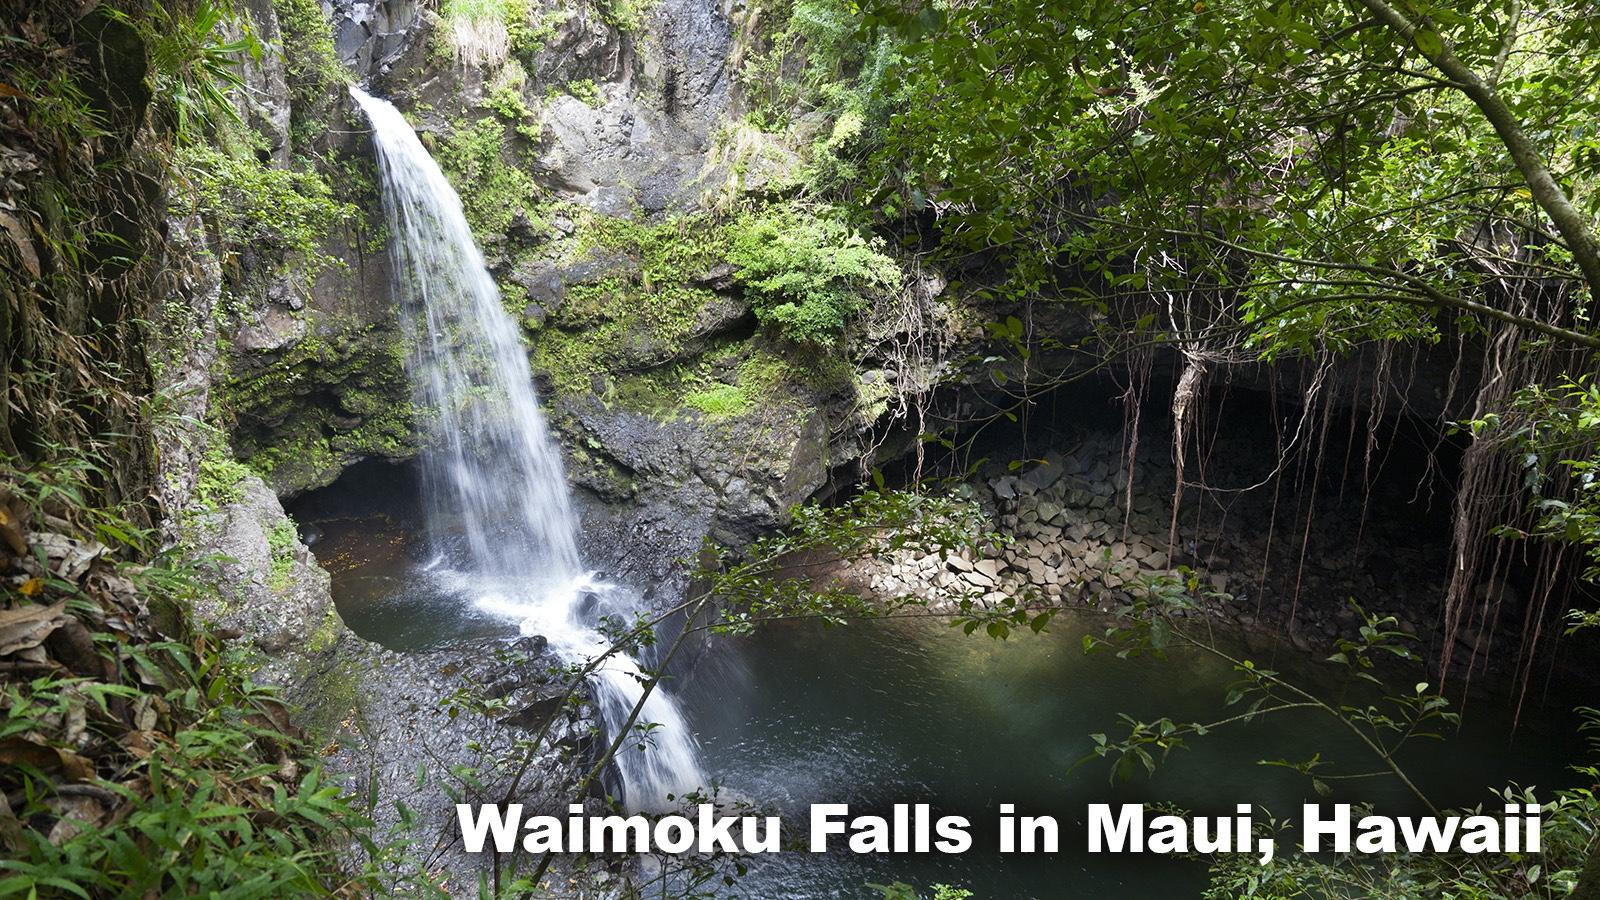 Rainforest Biome in Maui, Hawaii